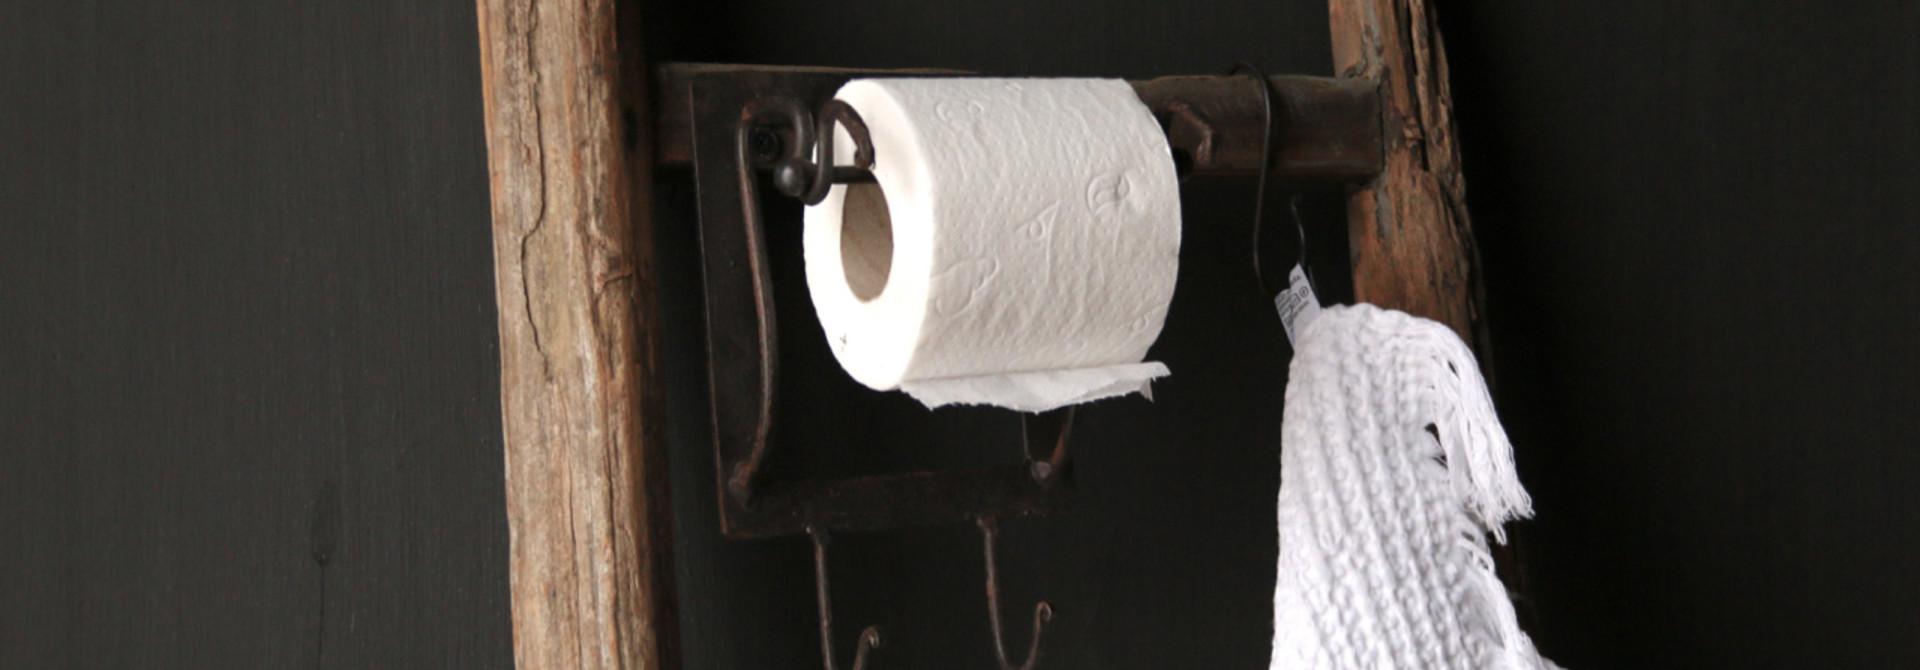 Toilettenpapier Toilettenpapierhalter Eisen